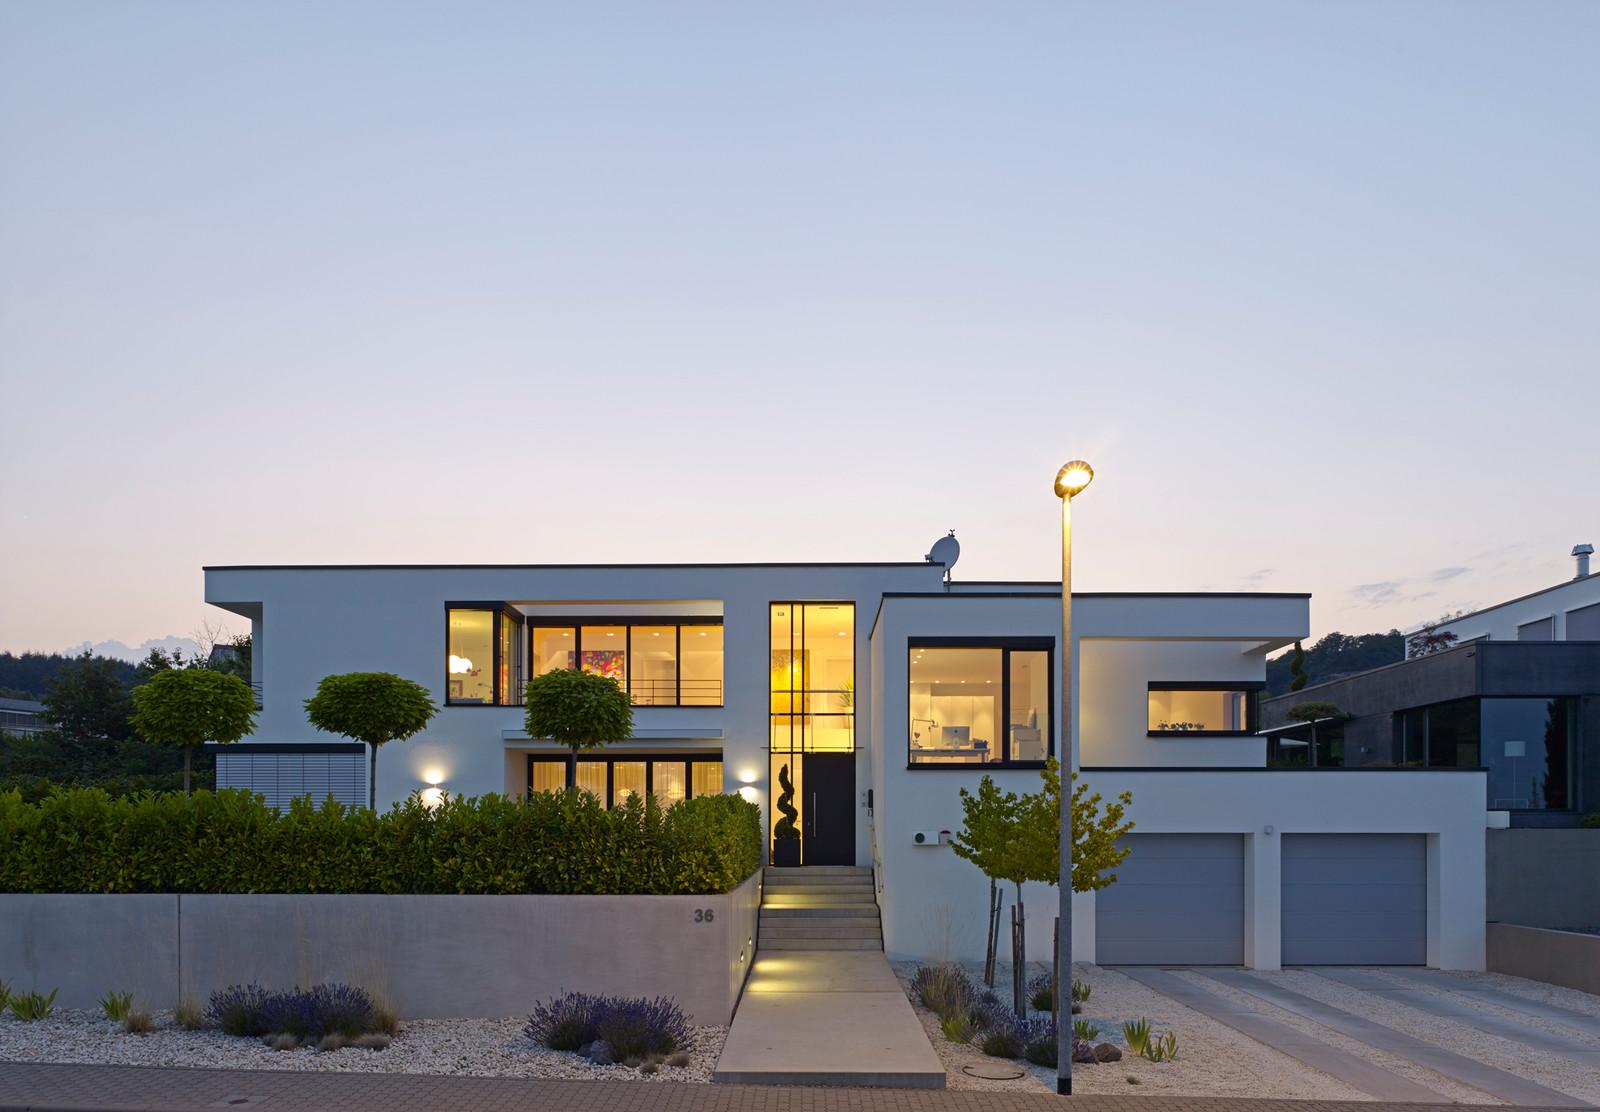 15 Stunning Modern Home Exterior Designs That Make A Statement - Exterior-designs